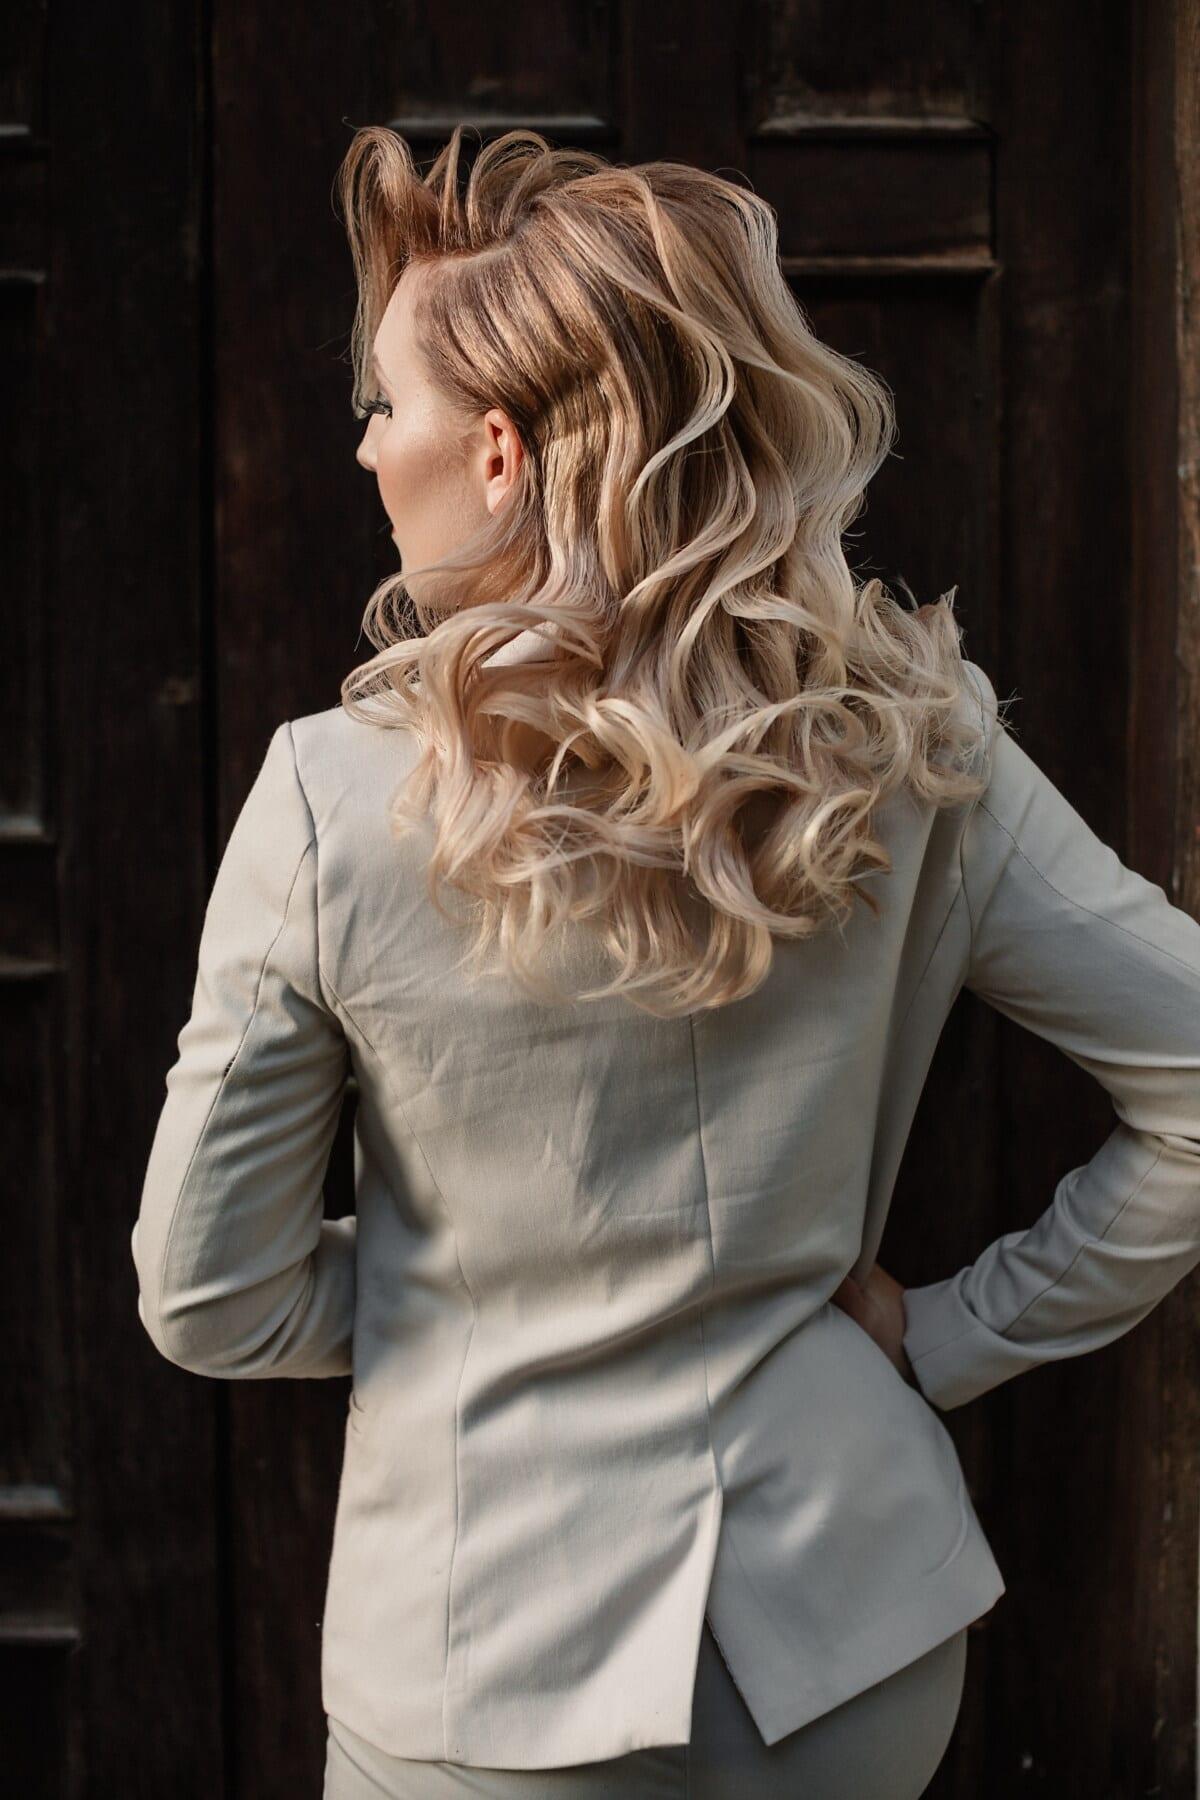 jacket, businesswoman, blonde hair, blonde, hairstyle, woman, model, attractive, portrait, fashion